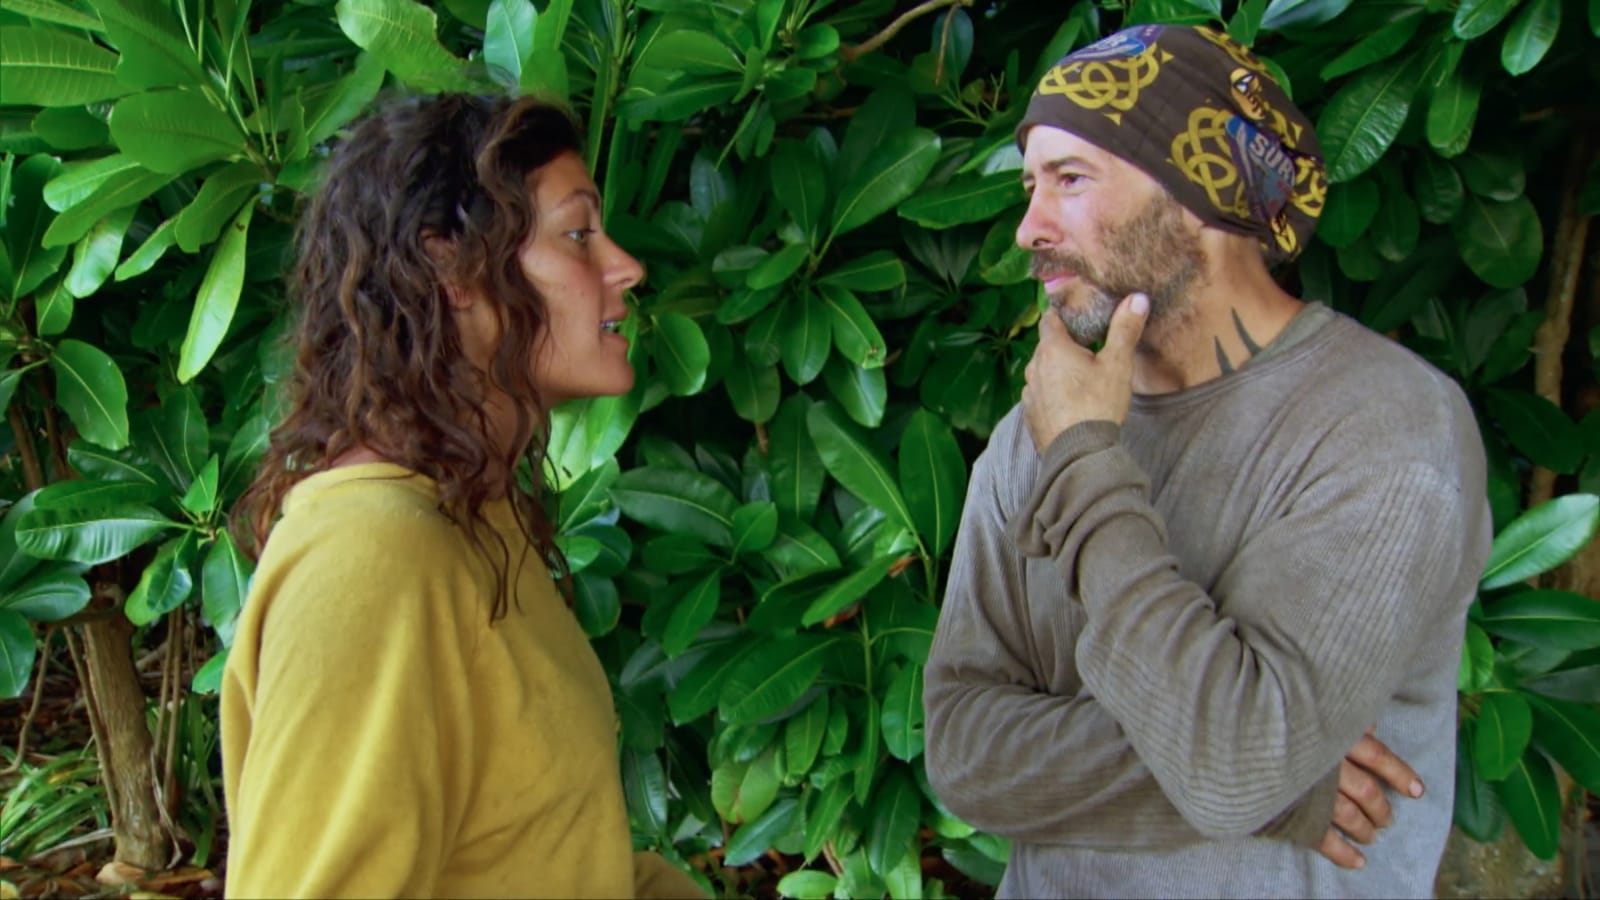 Michele Tony Survivor Winners at War episode 11